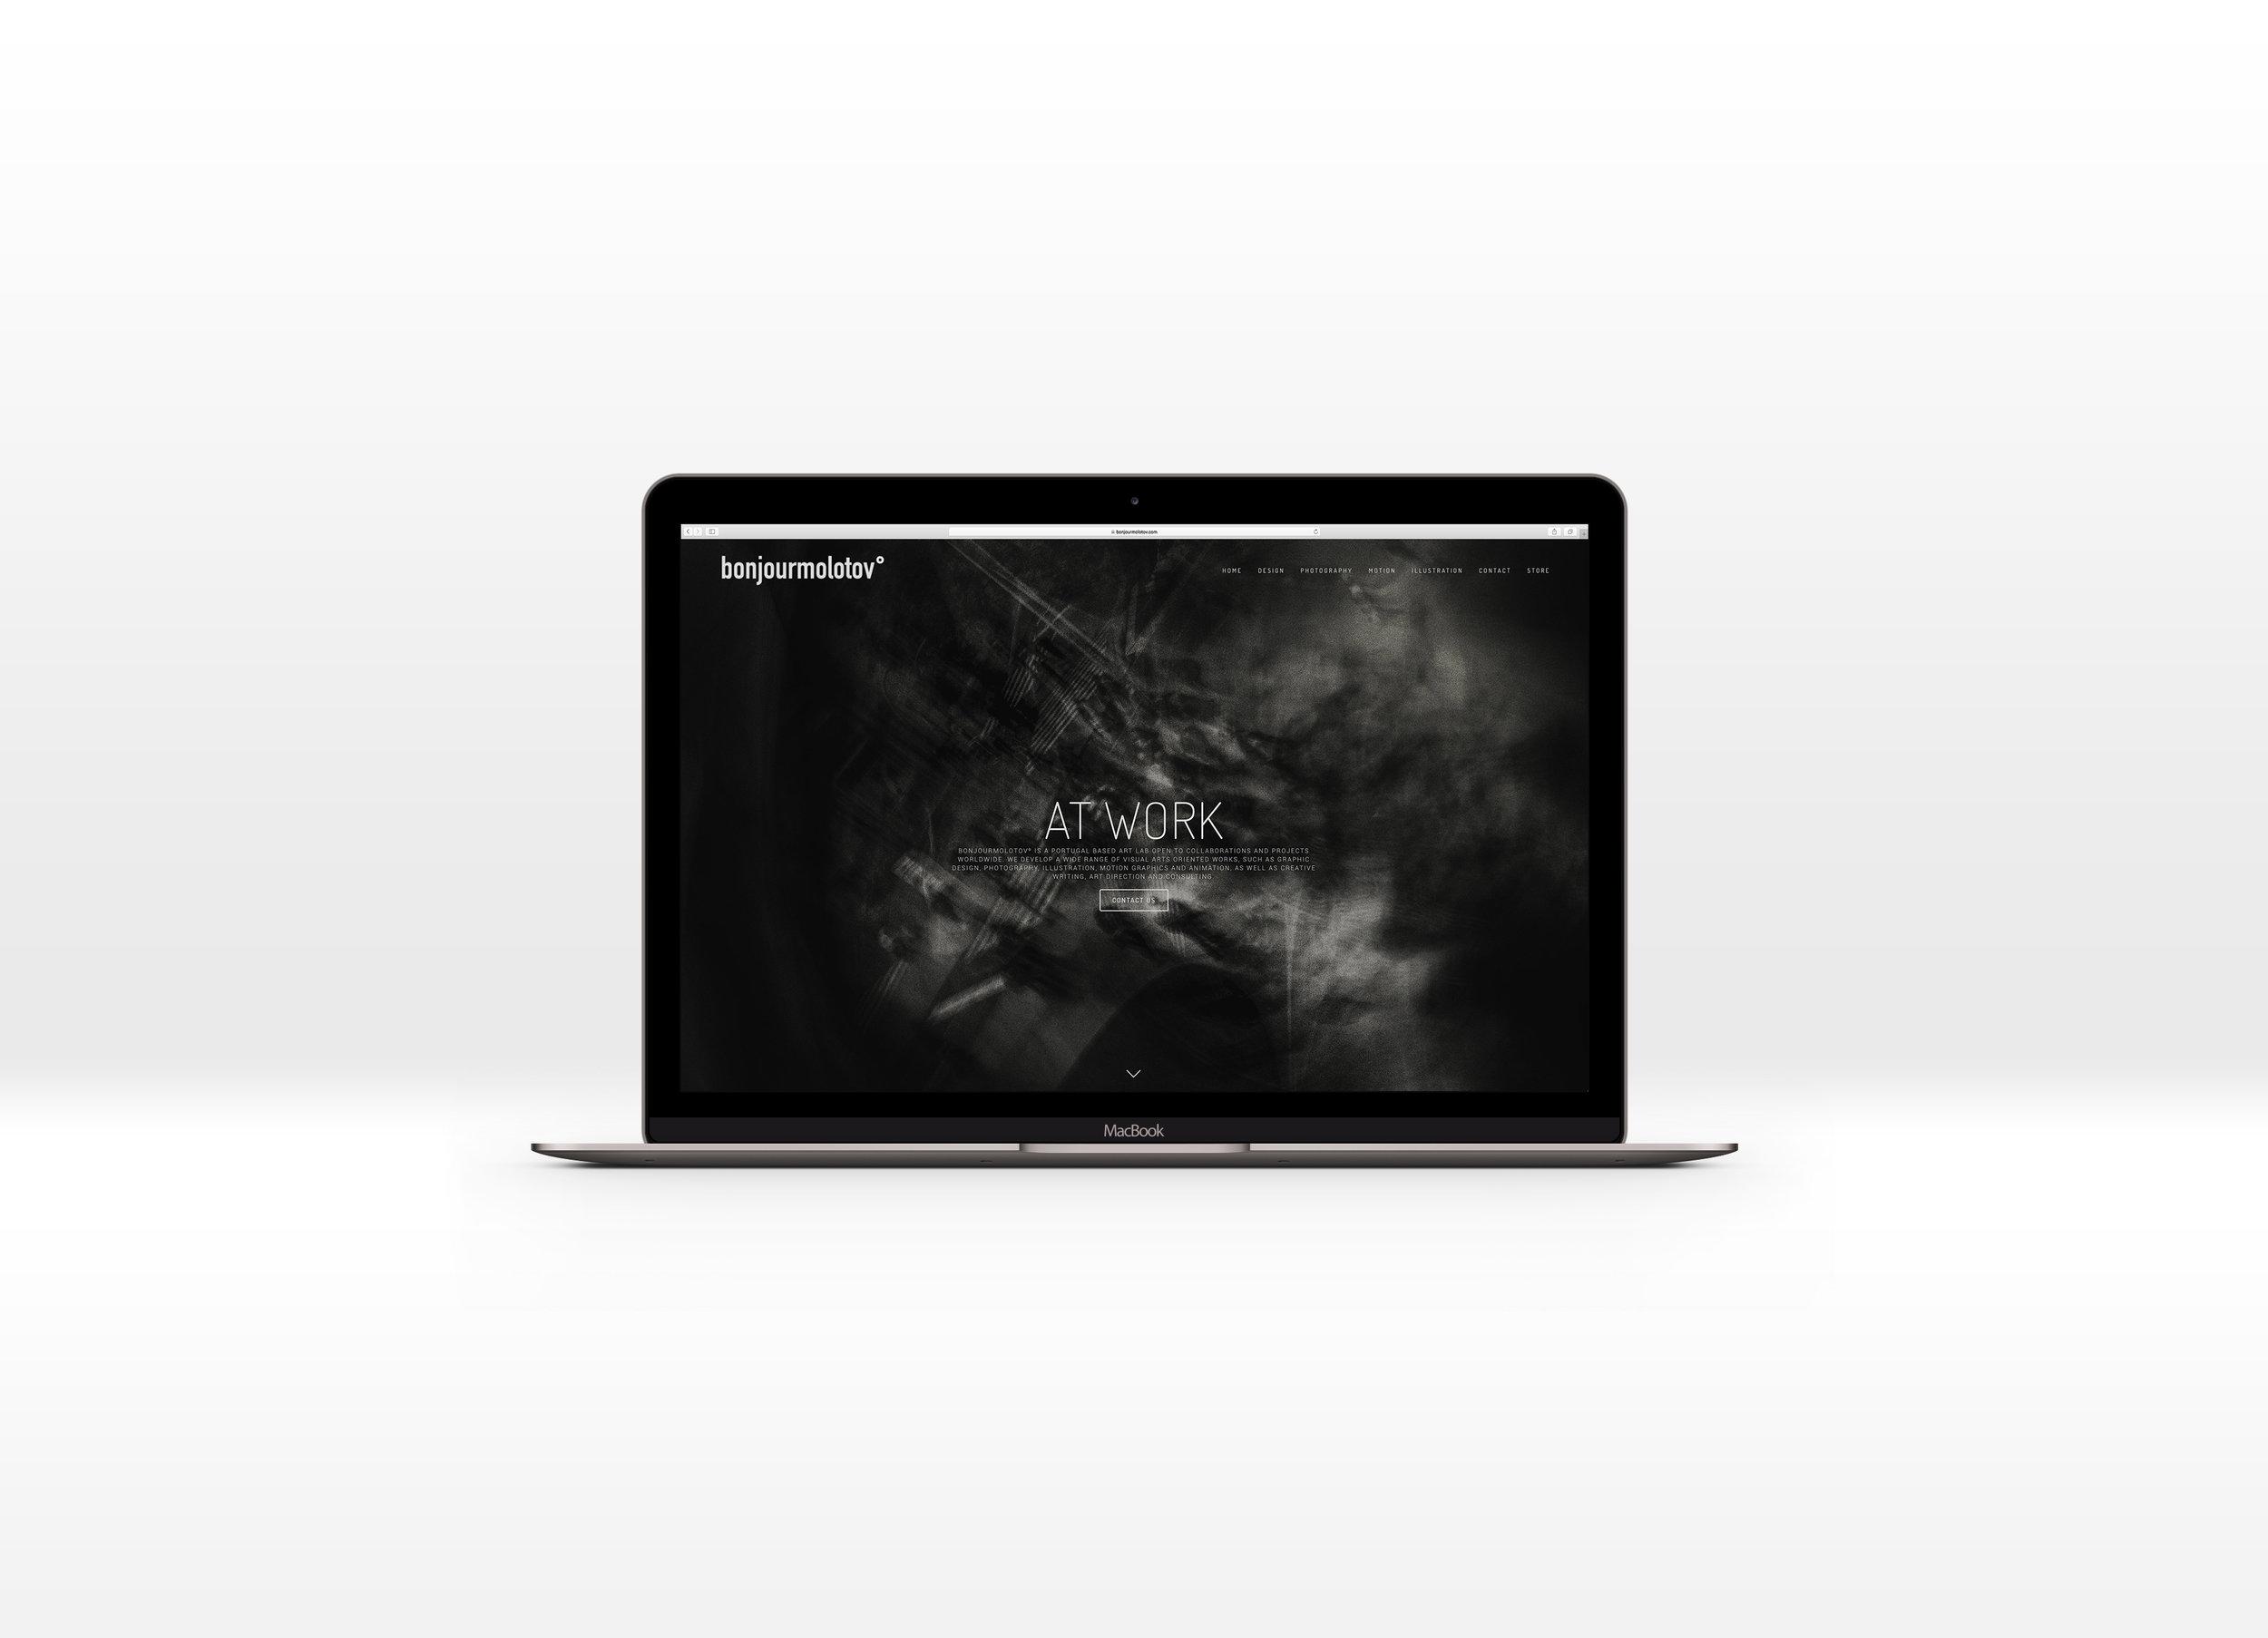 bonjourmolotov studio website graphic design web design 01.jpg